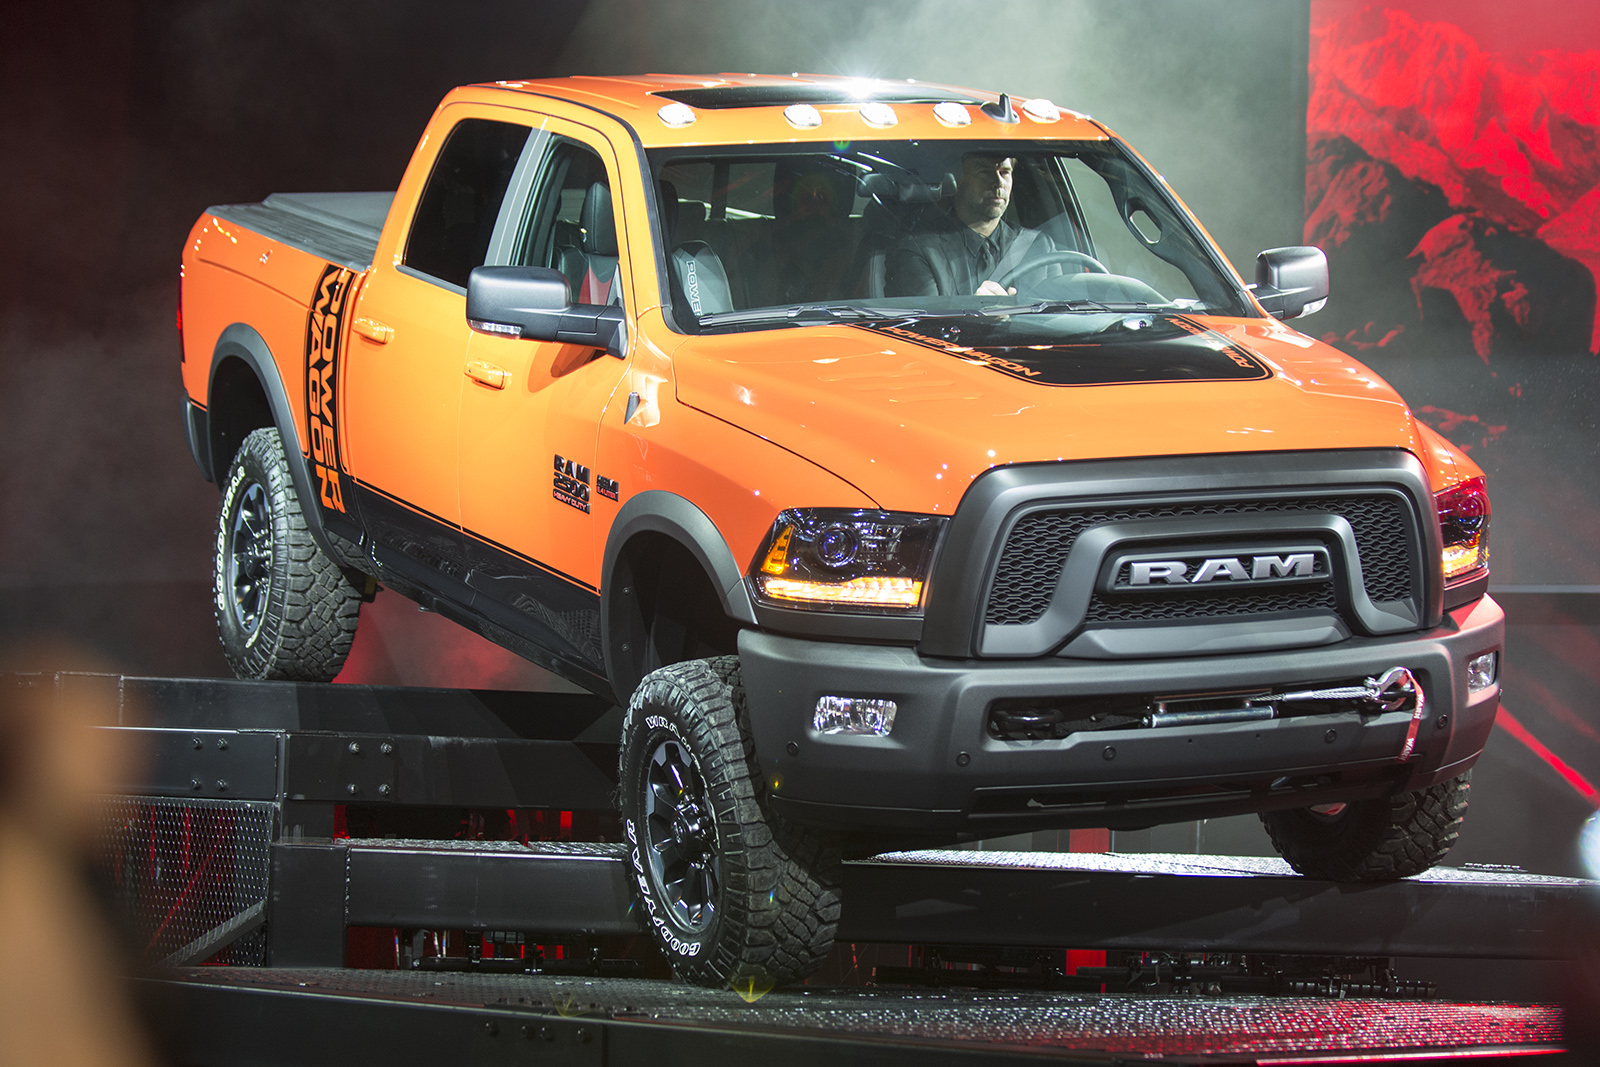 Ram 2500 Power Wagon (CARFAX, Inc.)